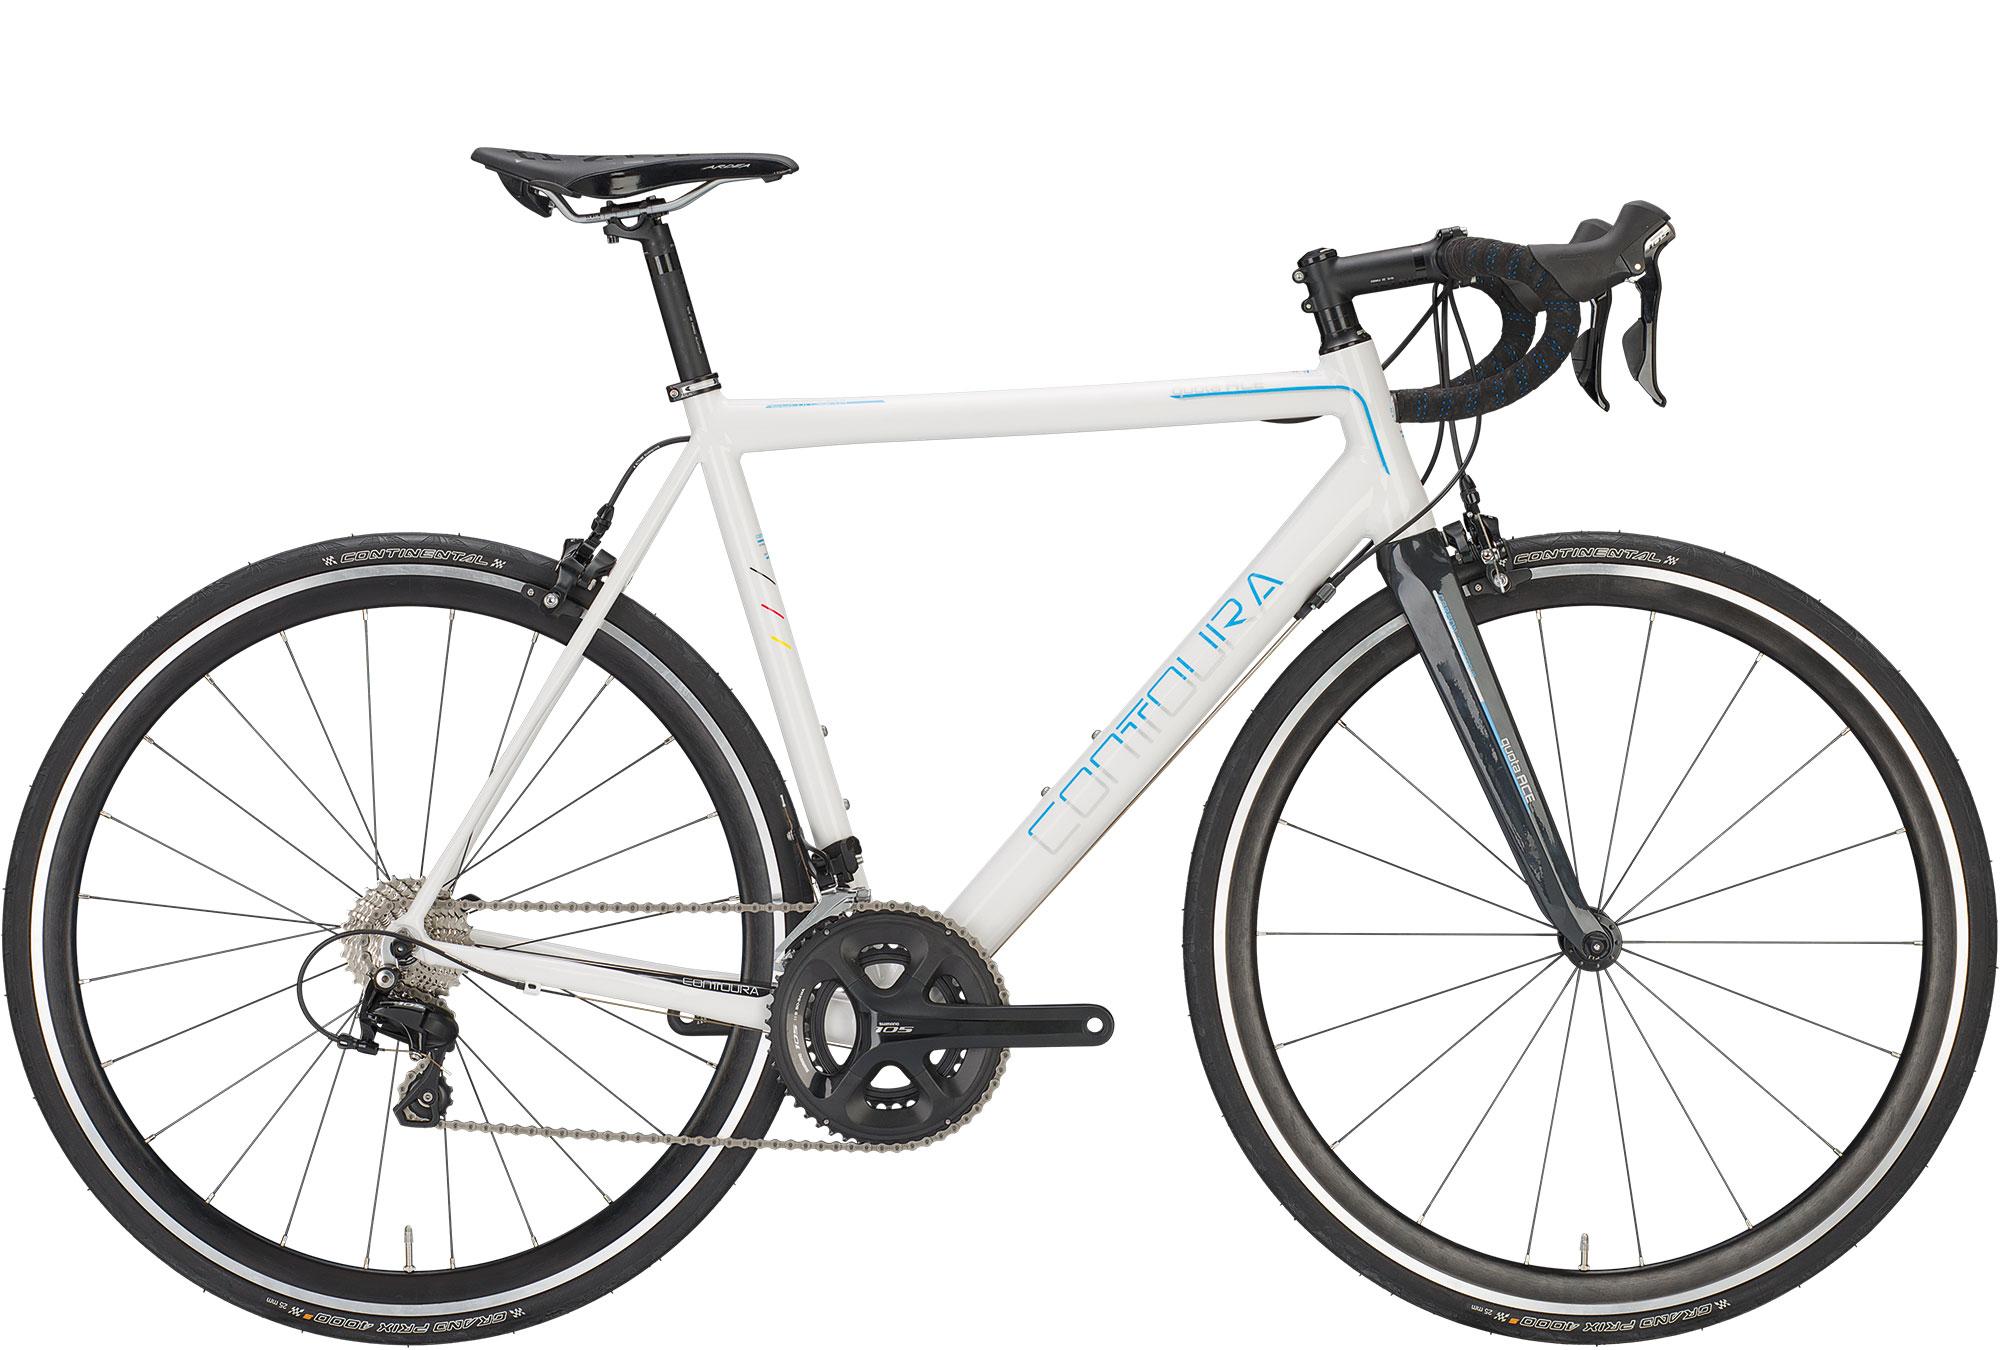 Home - Contoura | Fahrräder aus der Hartje Manufaktur